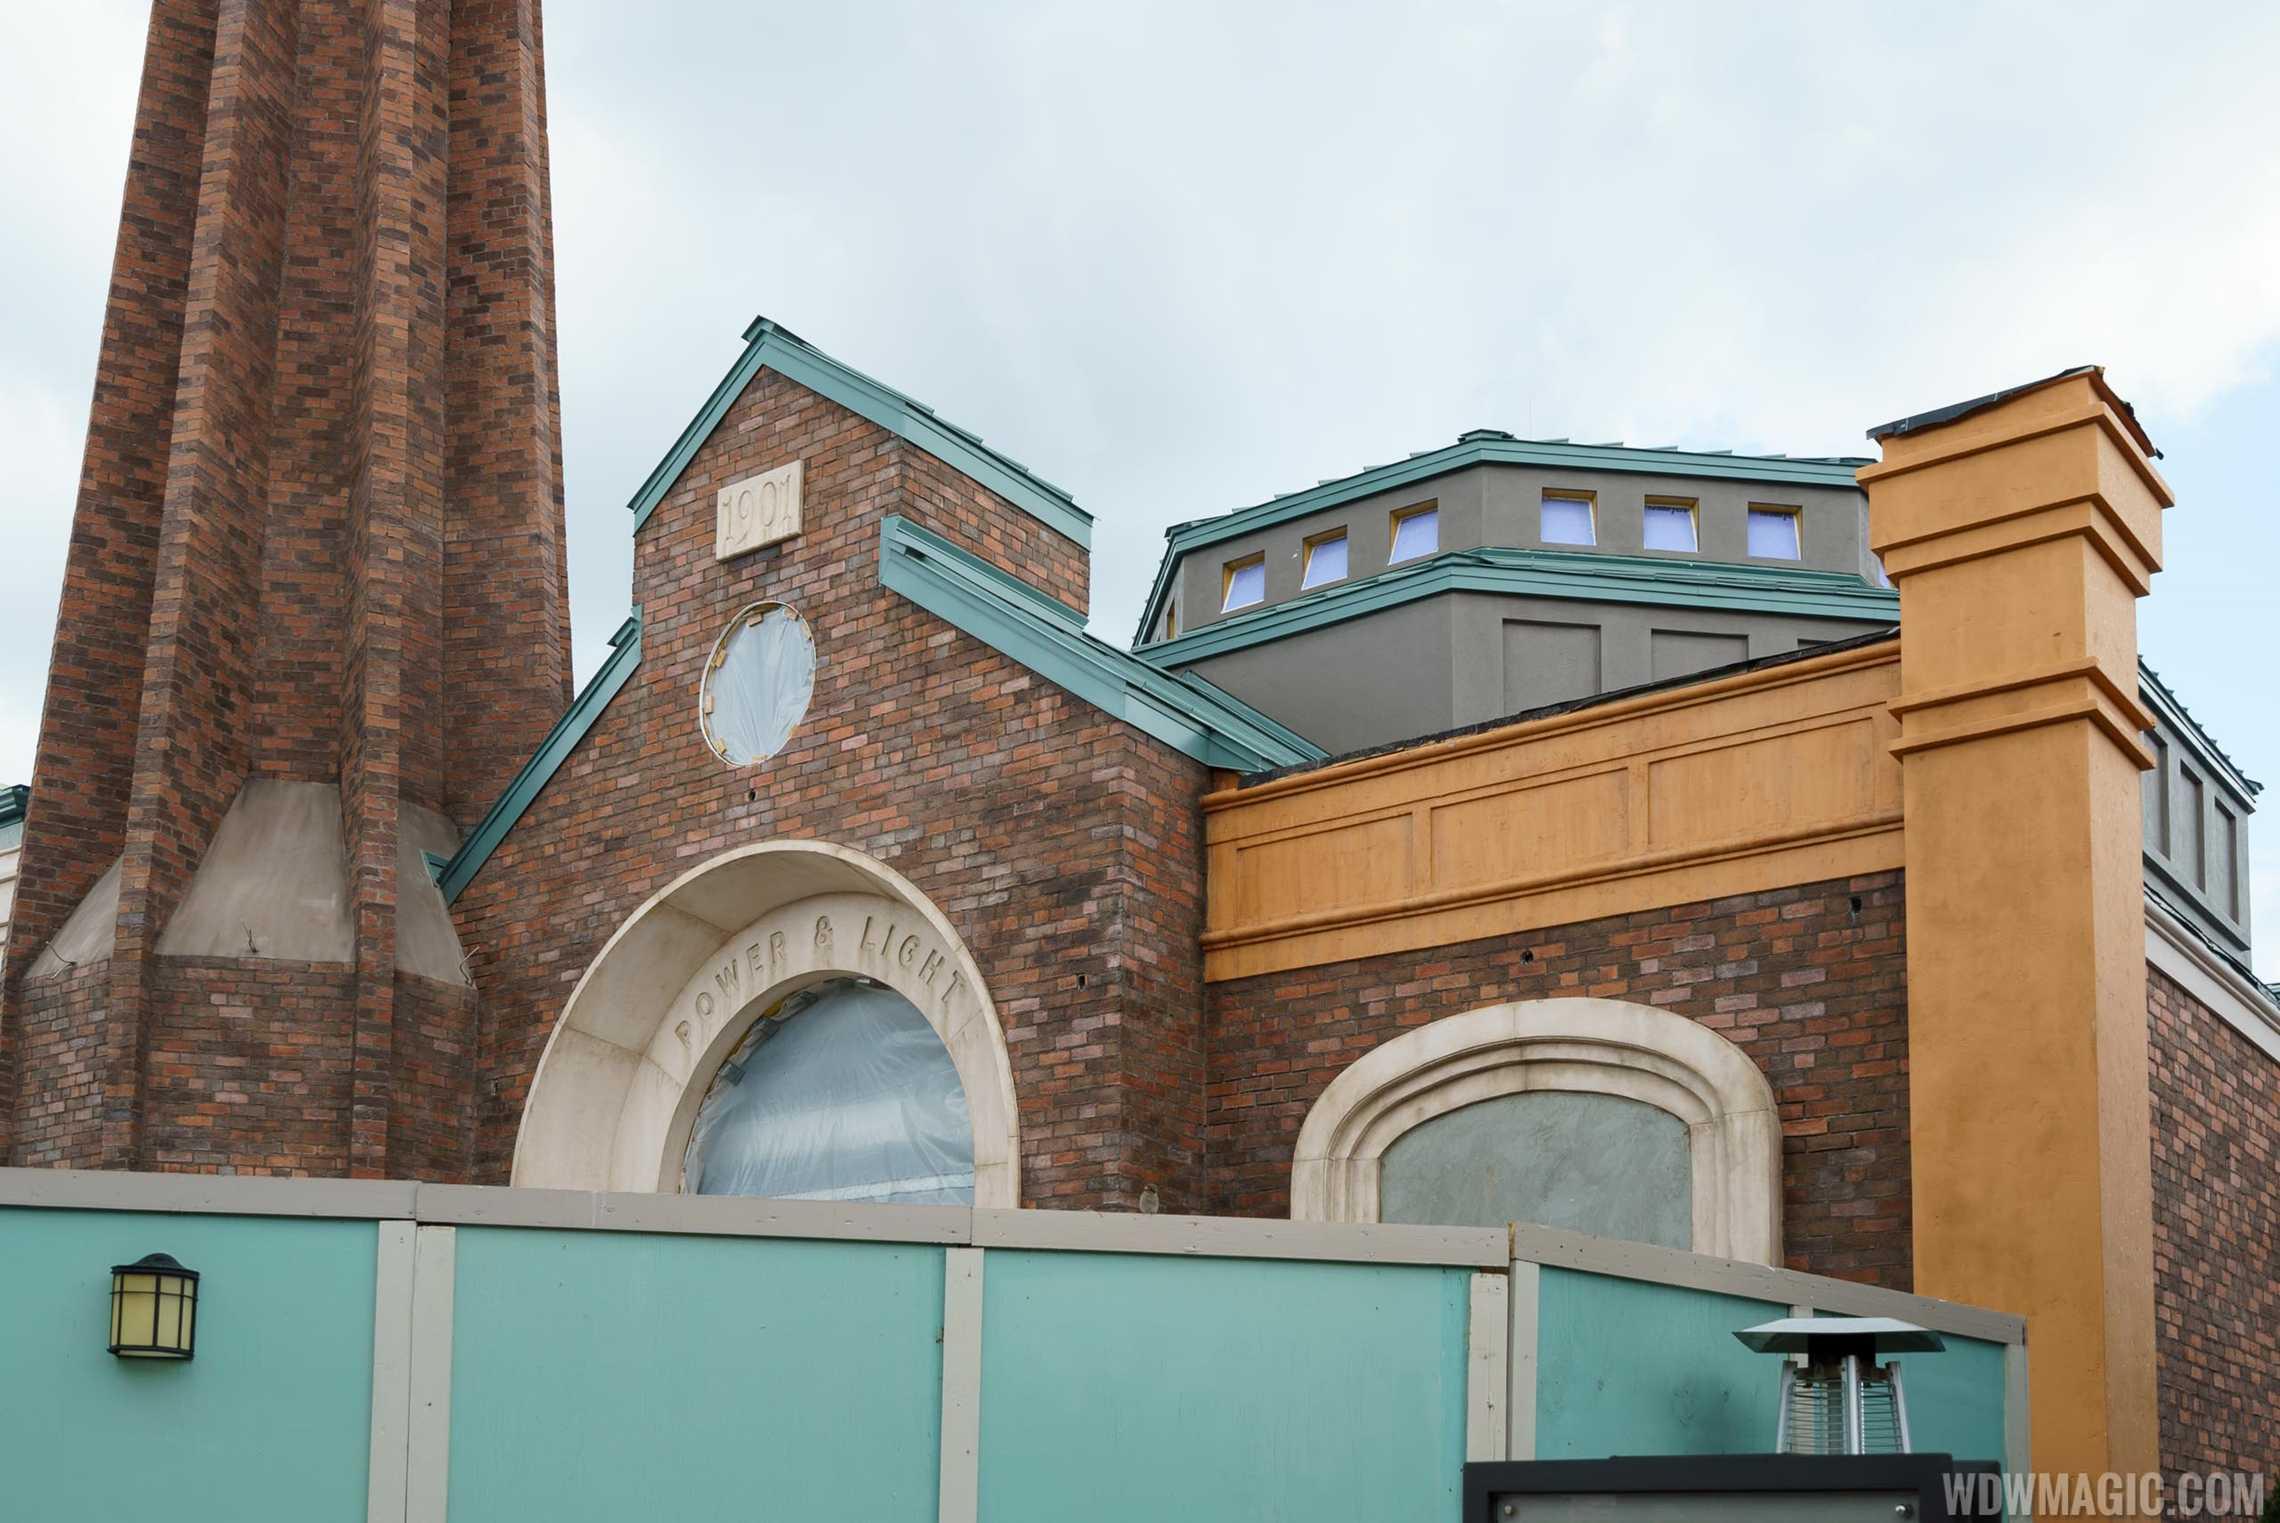 The Edison construction